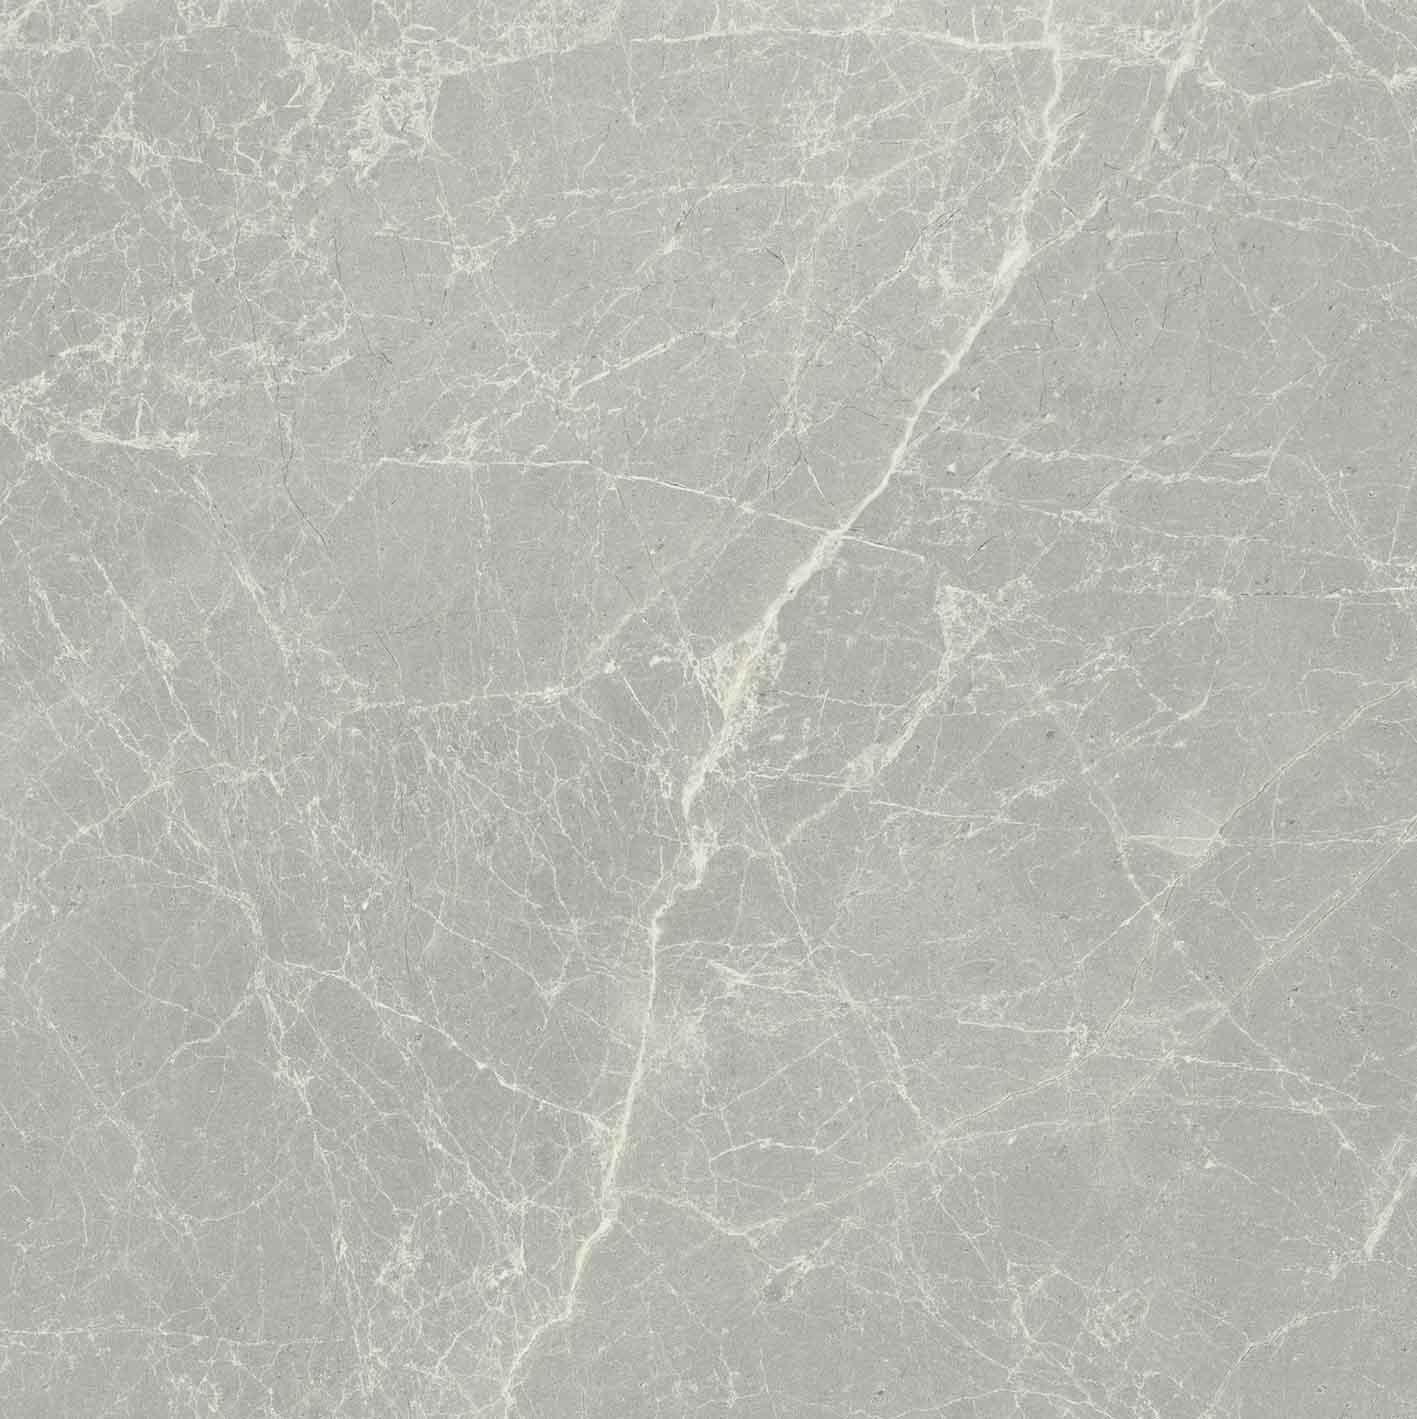 Exalt of Cerim Silver Light Glossy 10mm 60 x 60